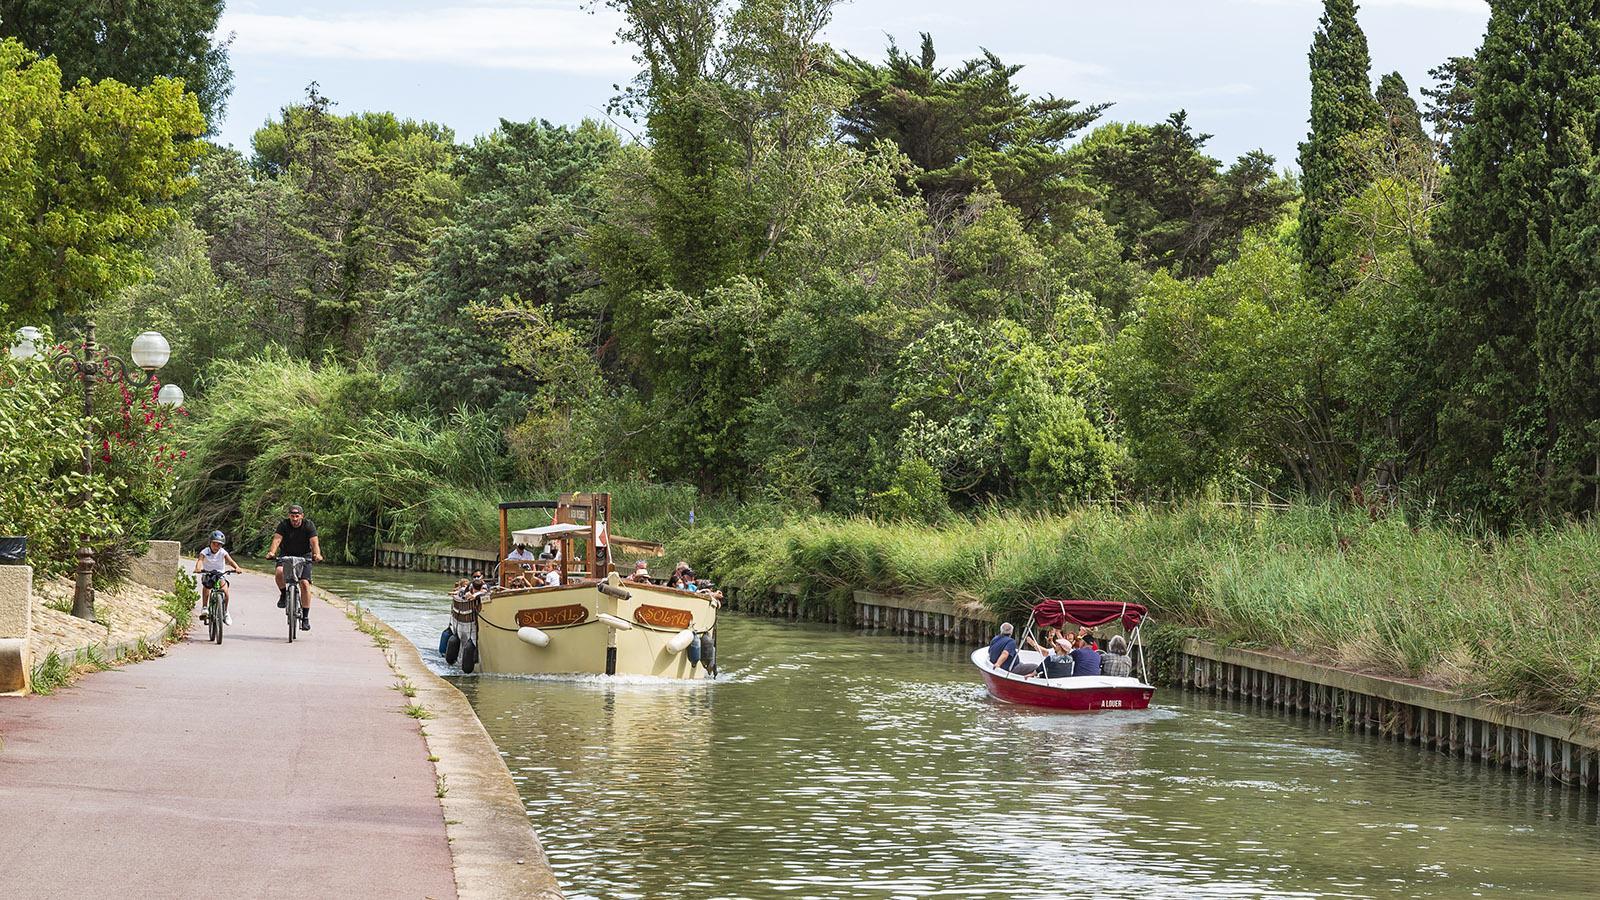 Unterwegs auf dem <em>Canal de la Robine</em>. Foto: Hilke Maunder